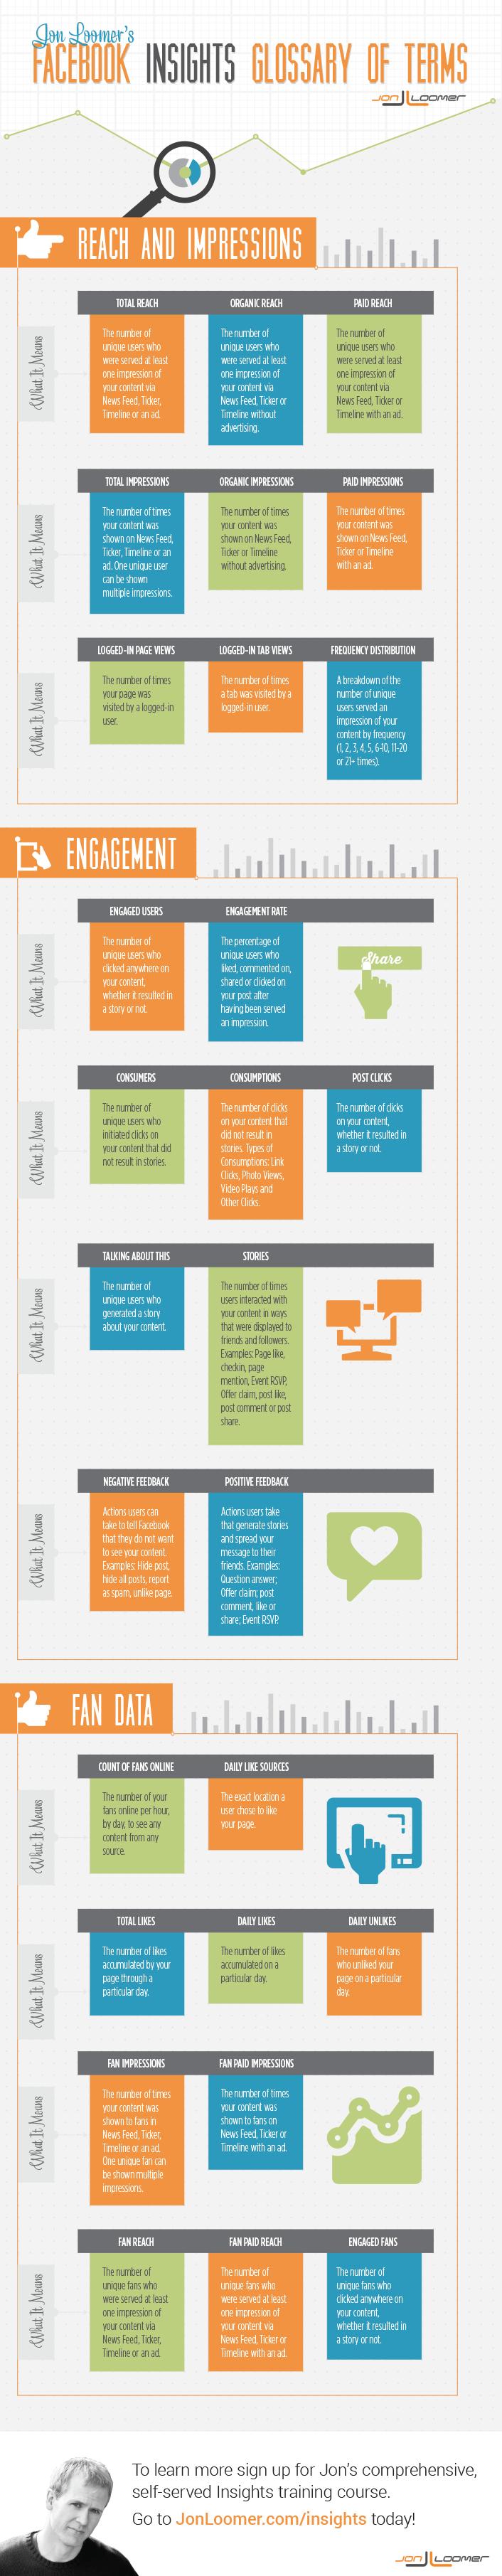 facebook insights glossary jonloomer Ultimate Guide: Facebook Insights Glossary of Terms [Infographic]